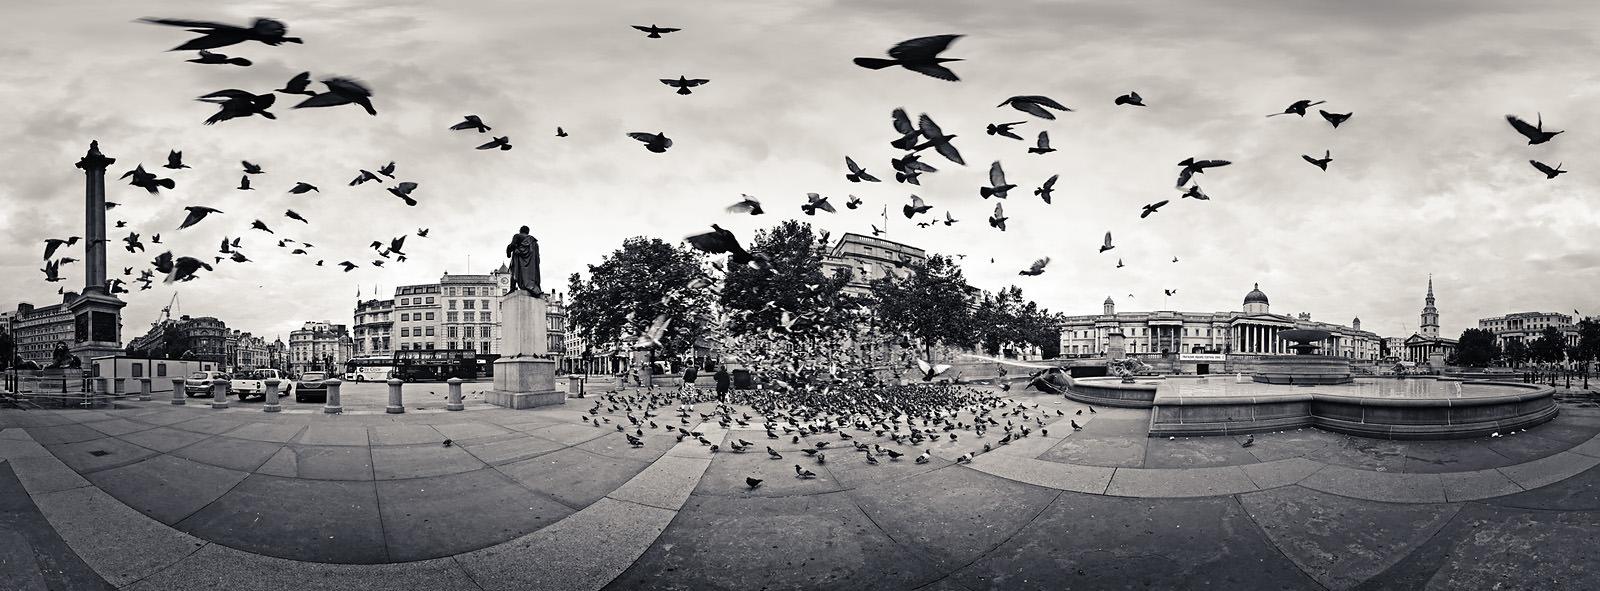 The Birds Acrylic - London Black & White Fine Art Photo